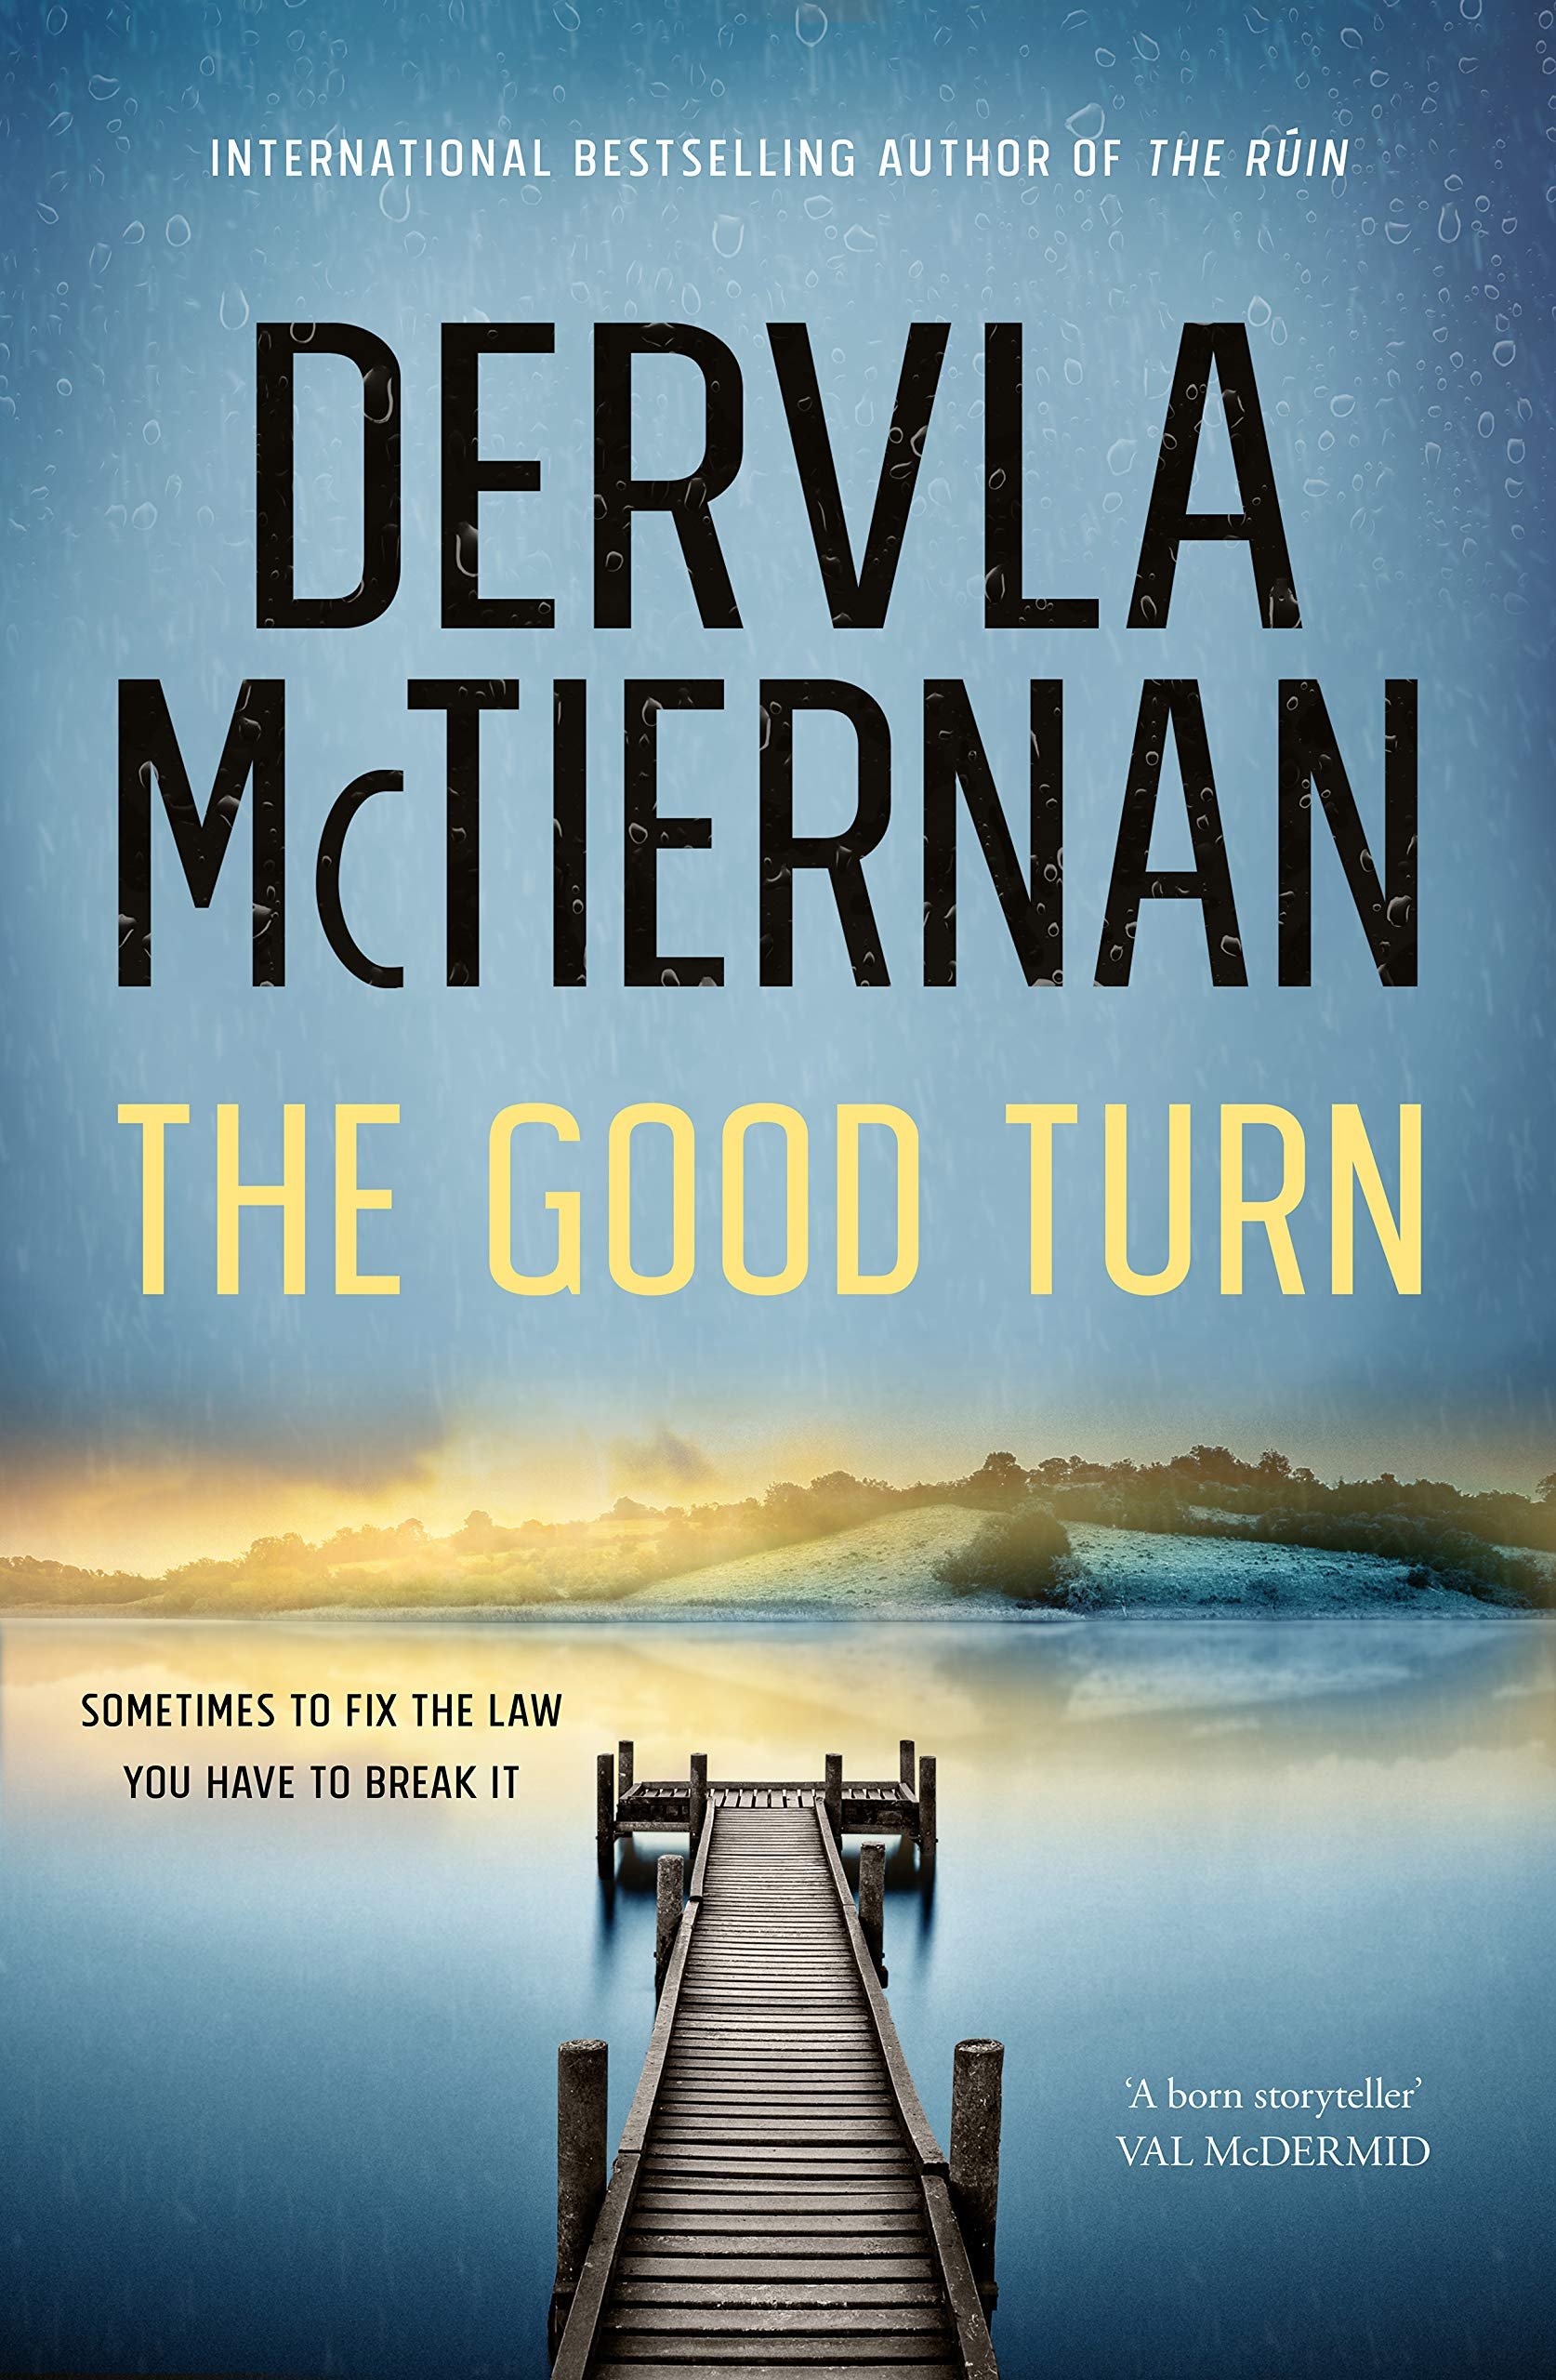 The Good Turn: McTiernan, Dervla: 9781460756799: Amazon.com: Books